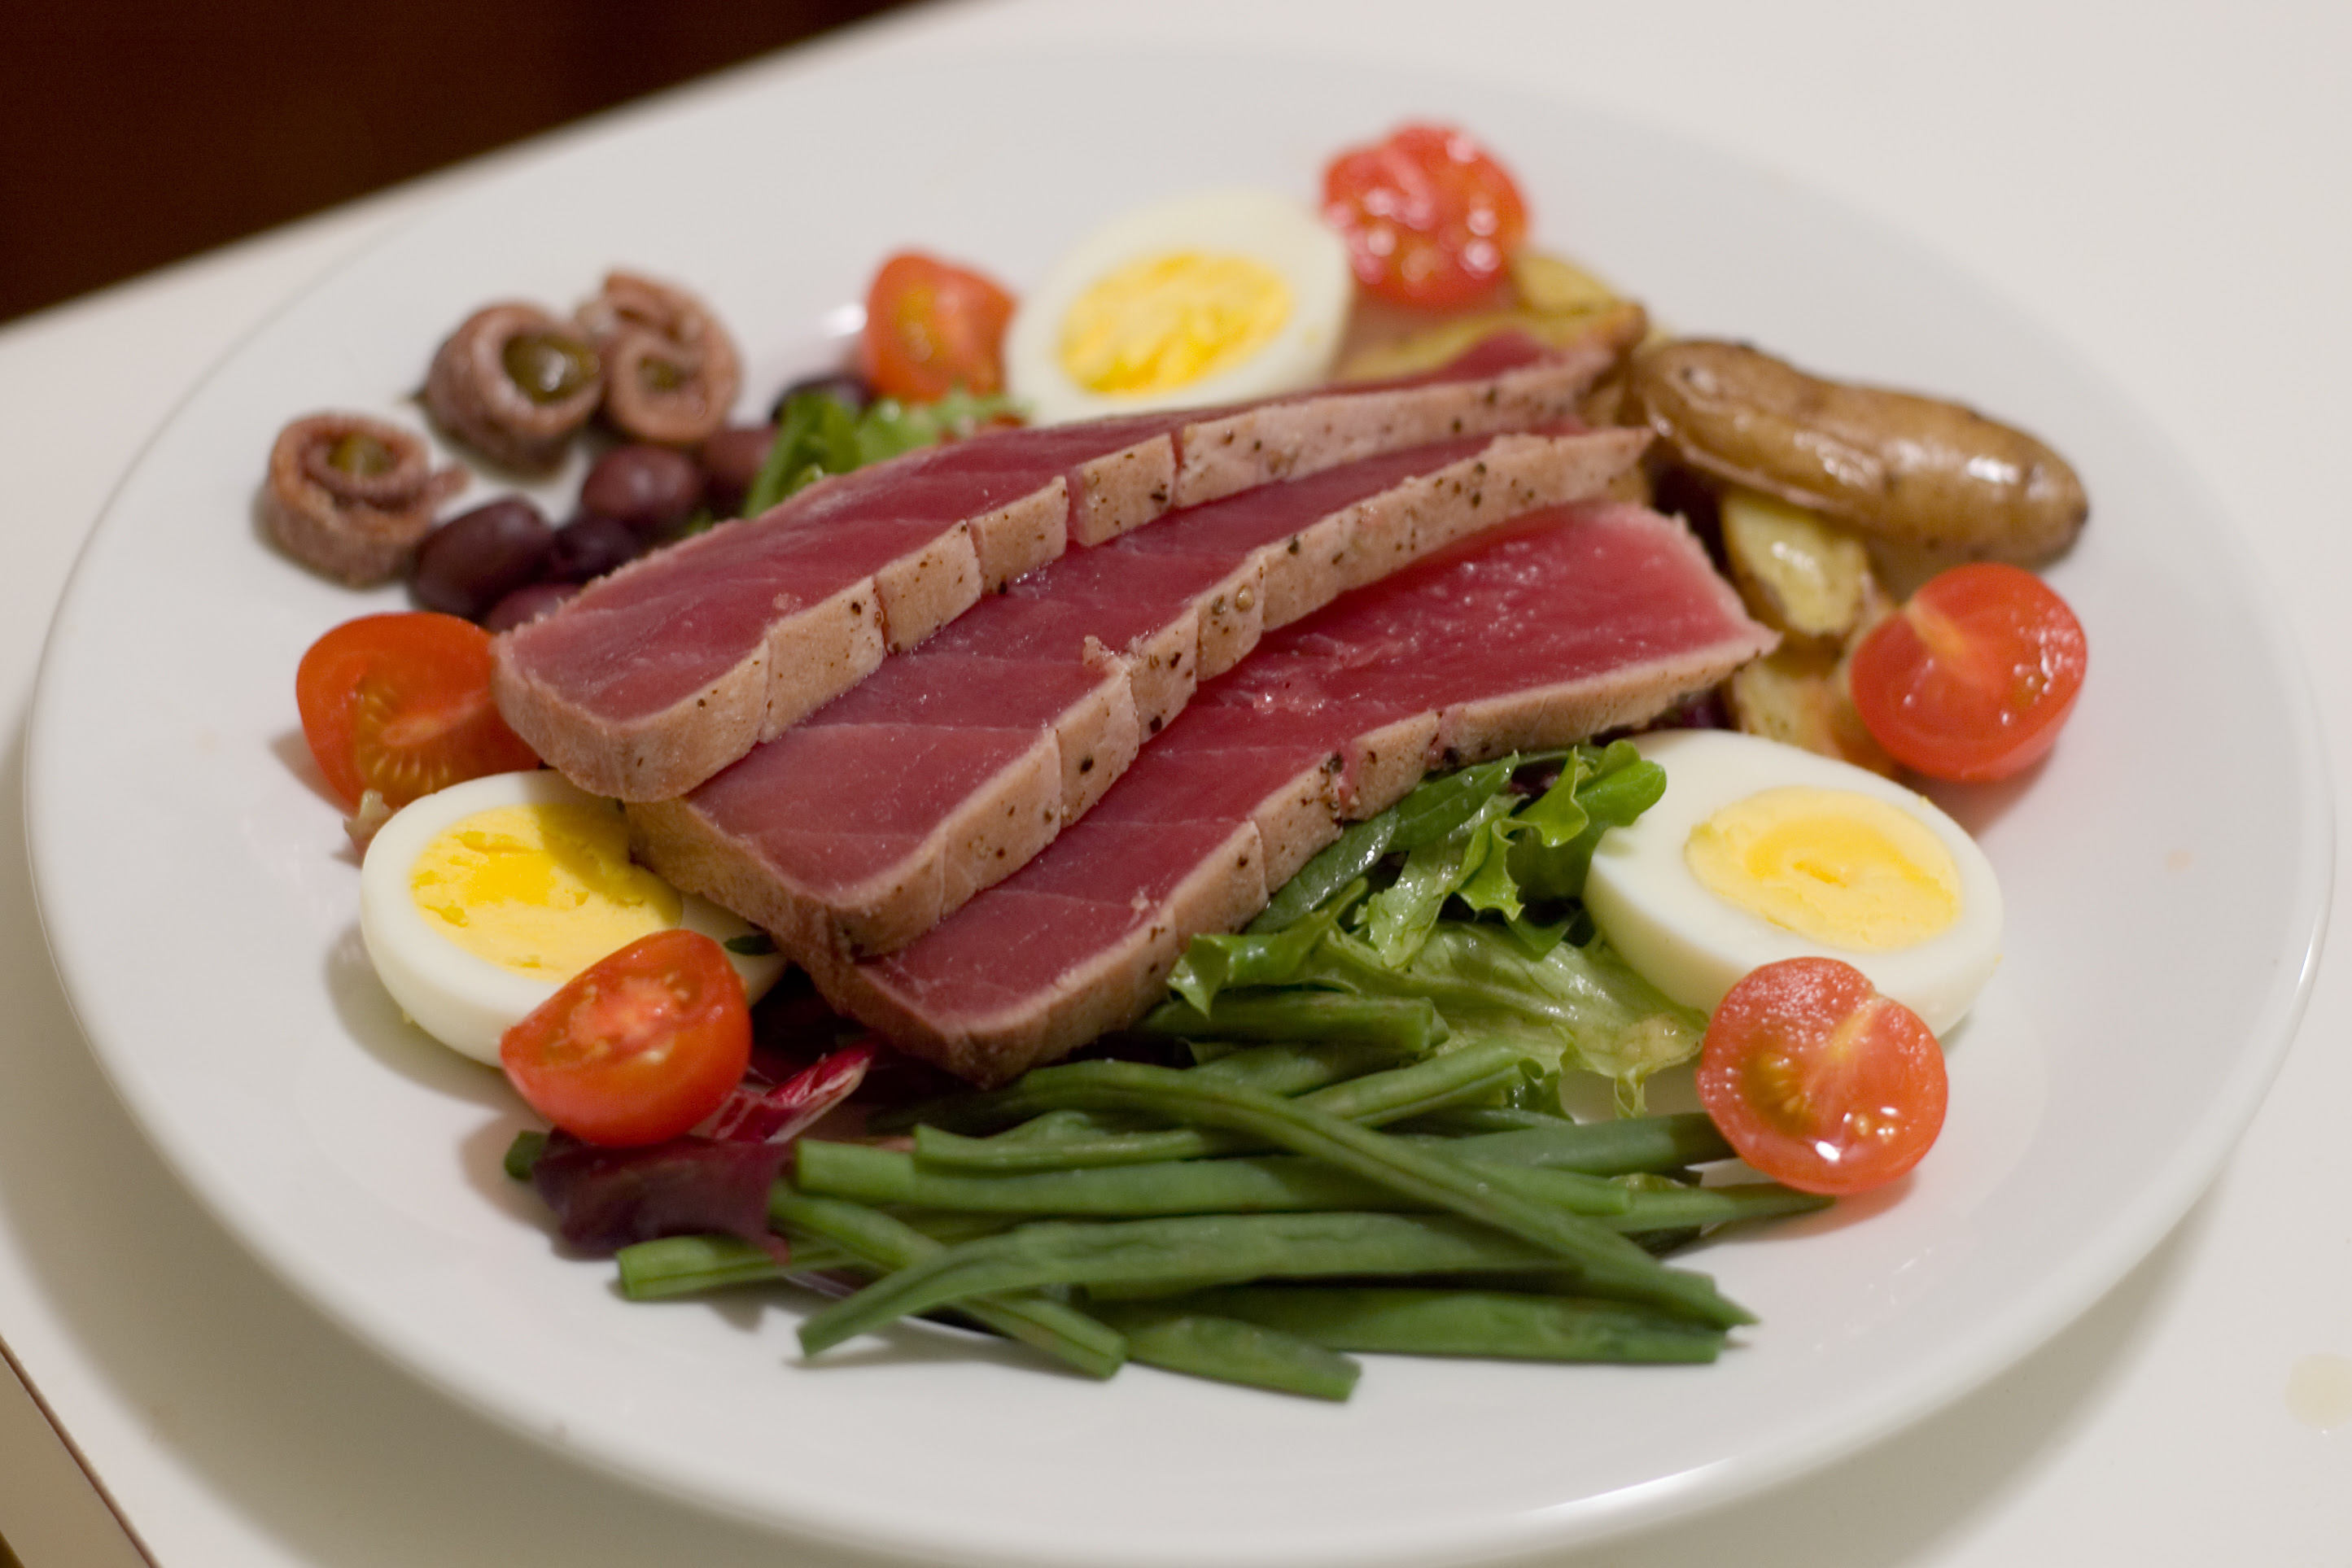 http://upload.wikimedia.org/wikipedia/commons/b/b0/Salade_nicoise.jpg